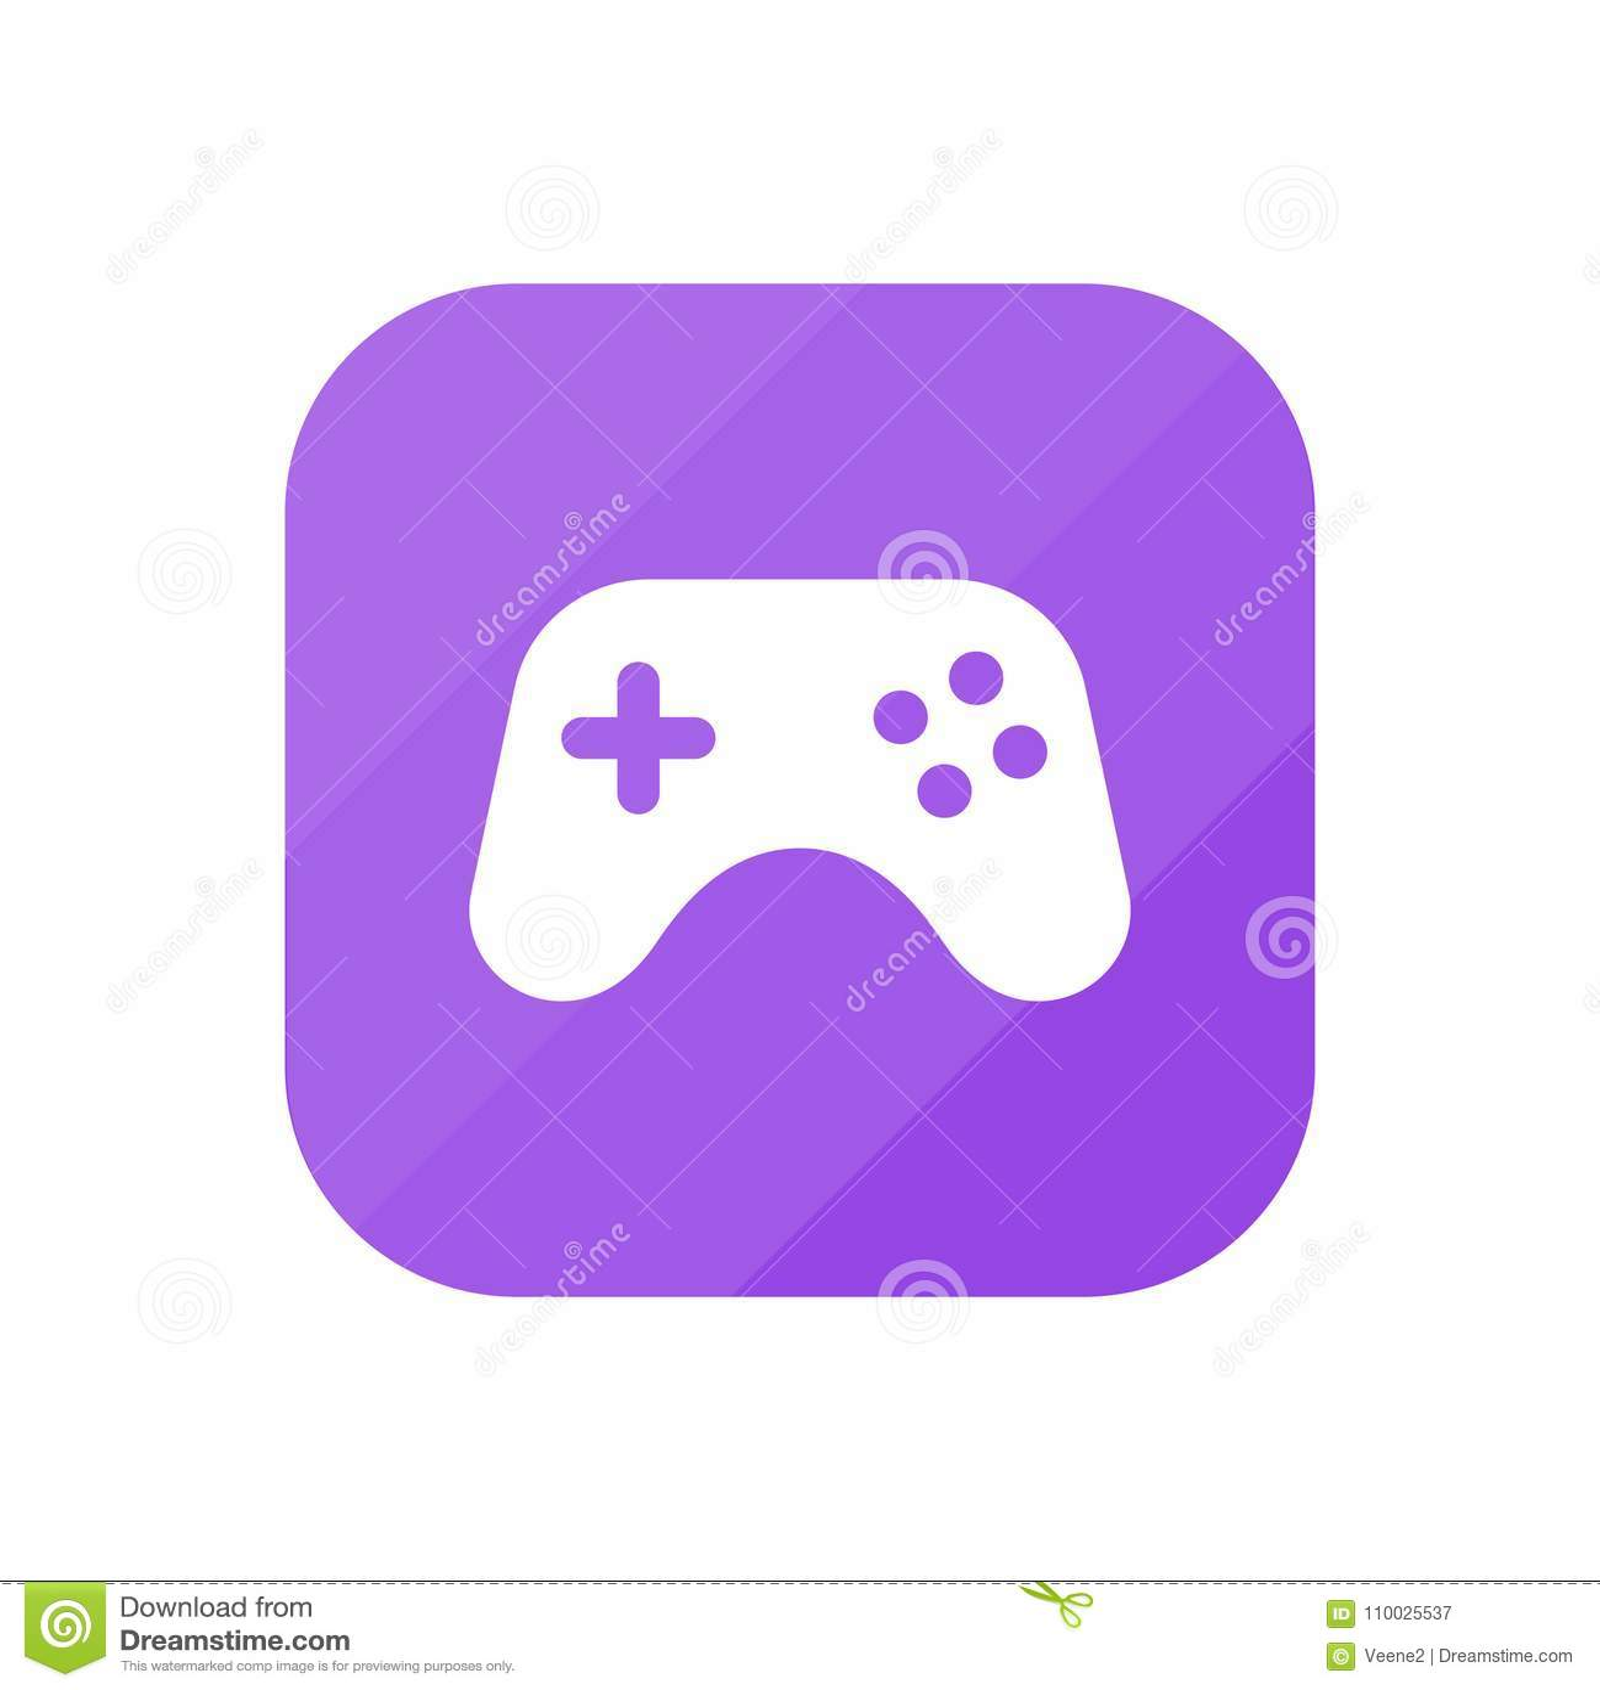 Spel - App Pictogram